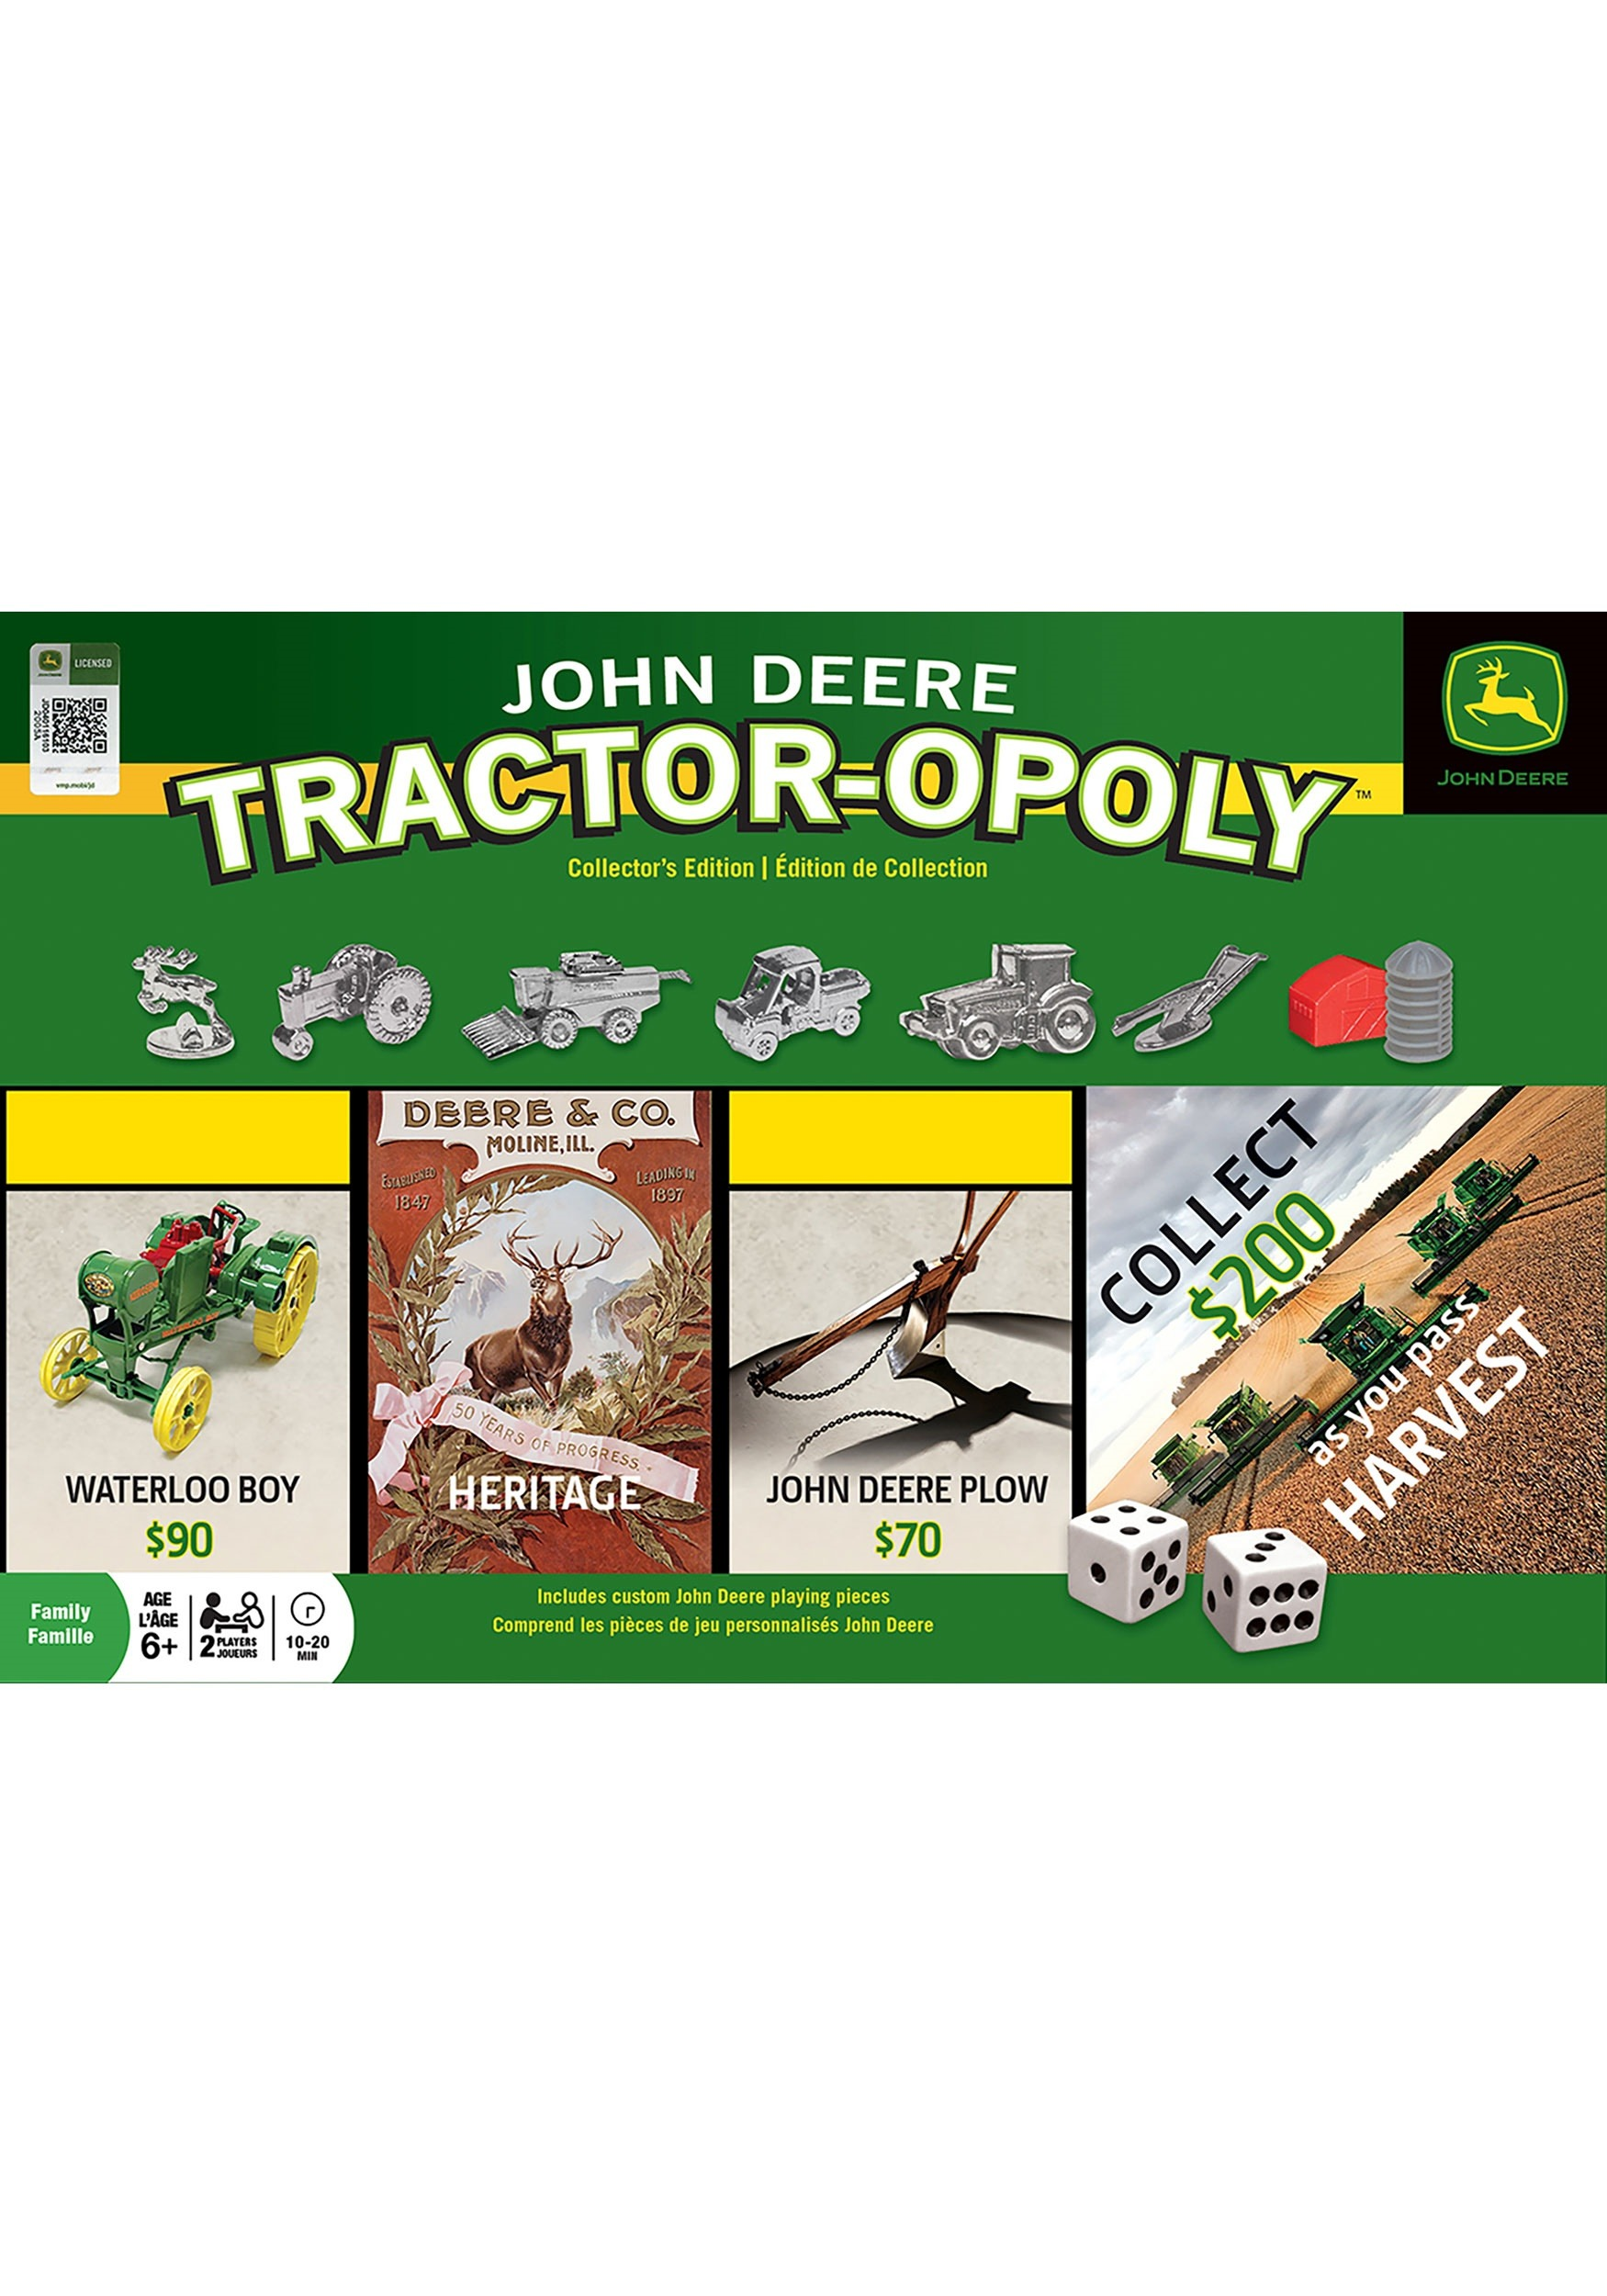 John Deere Tractor-Opoly Board Game